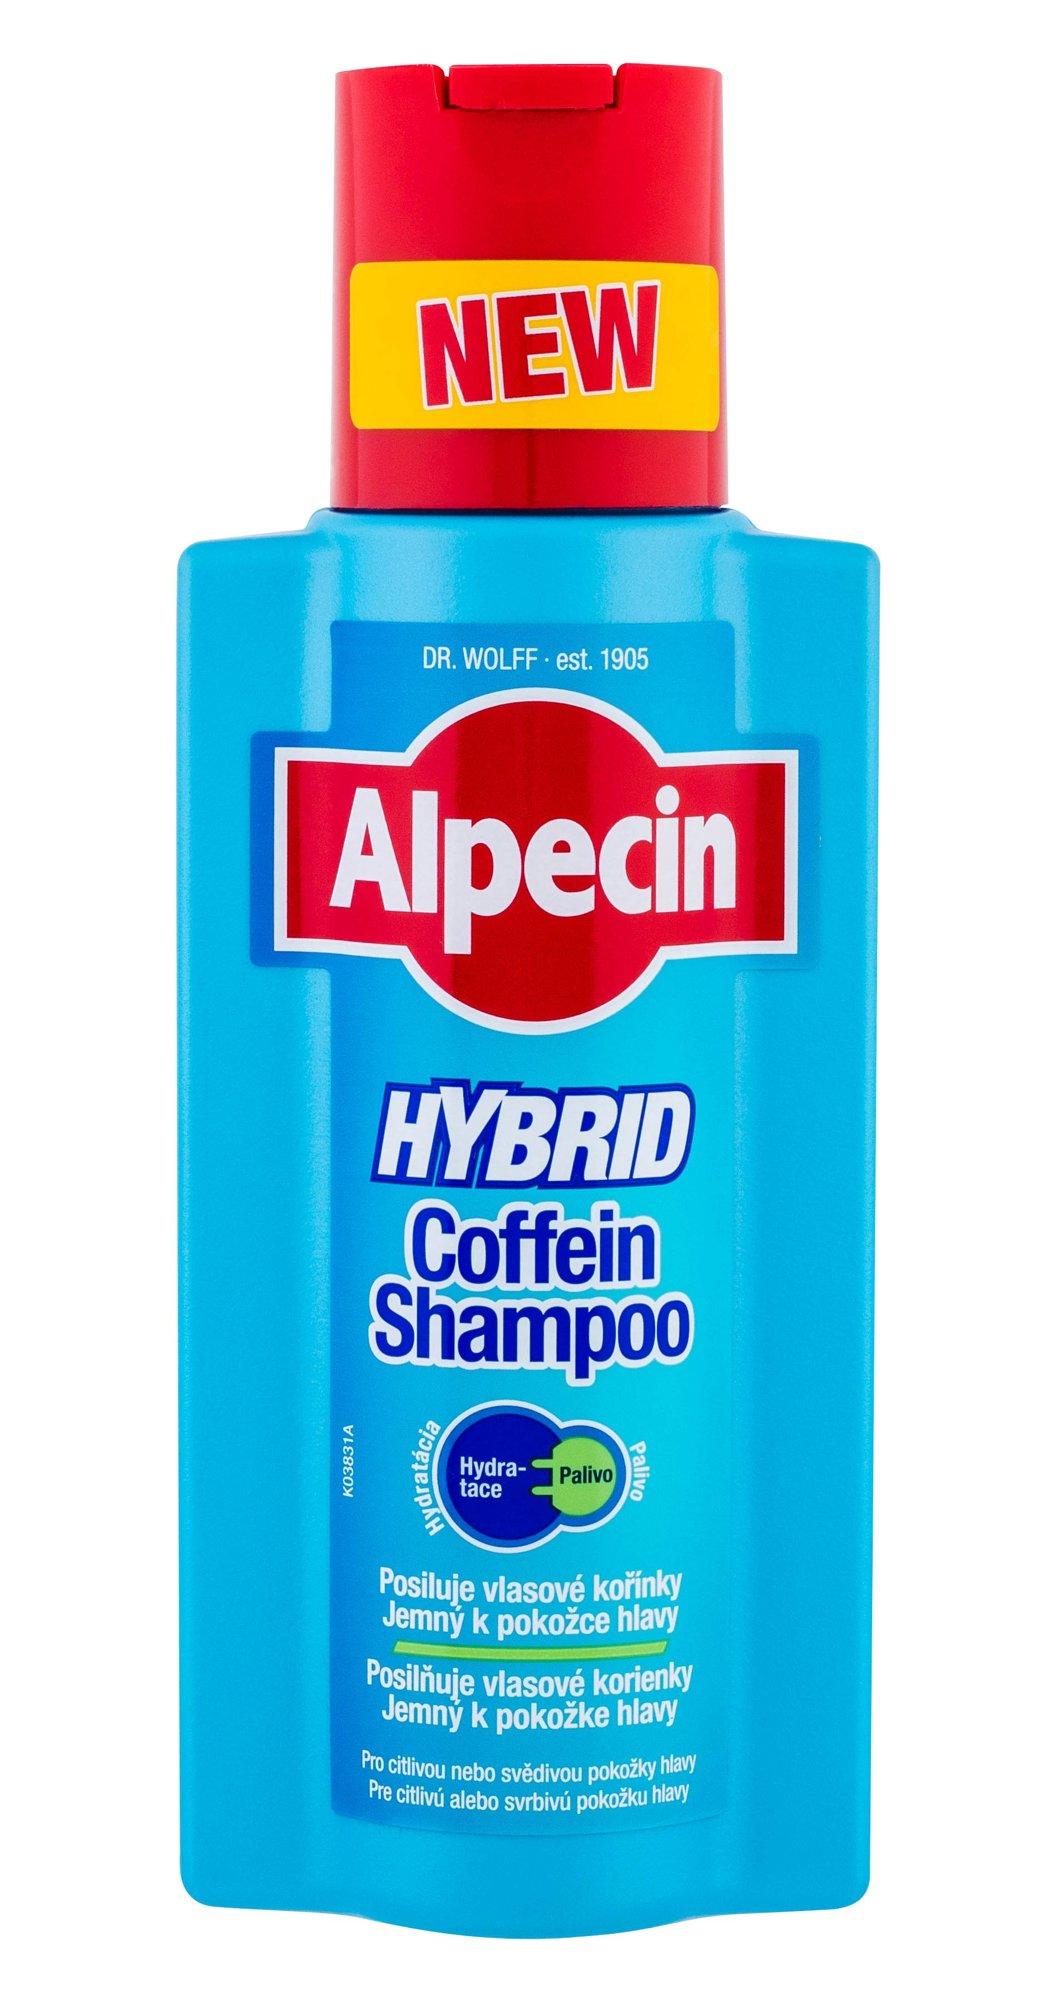 Alpecin Hybrid Coffein Shampoo Shampoo 250ml